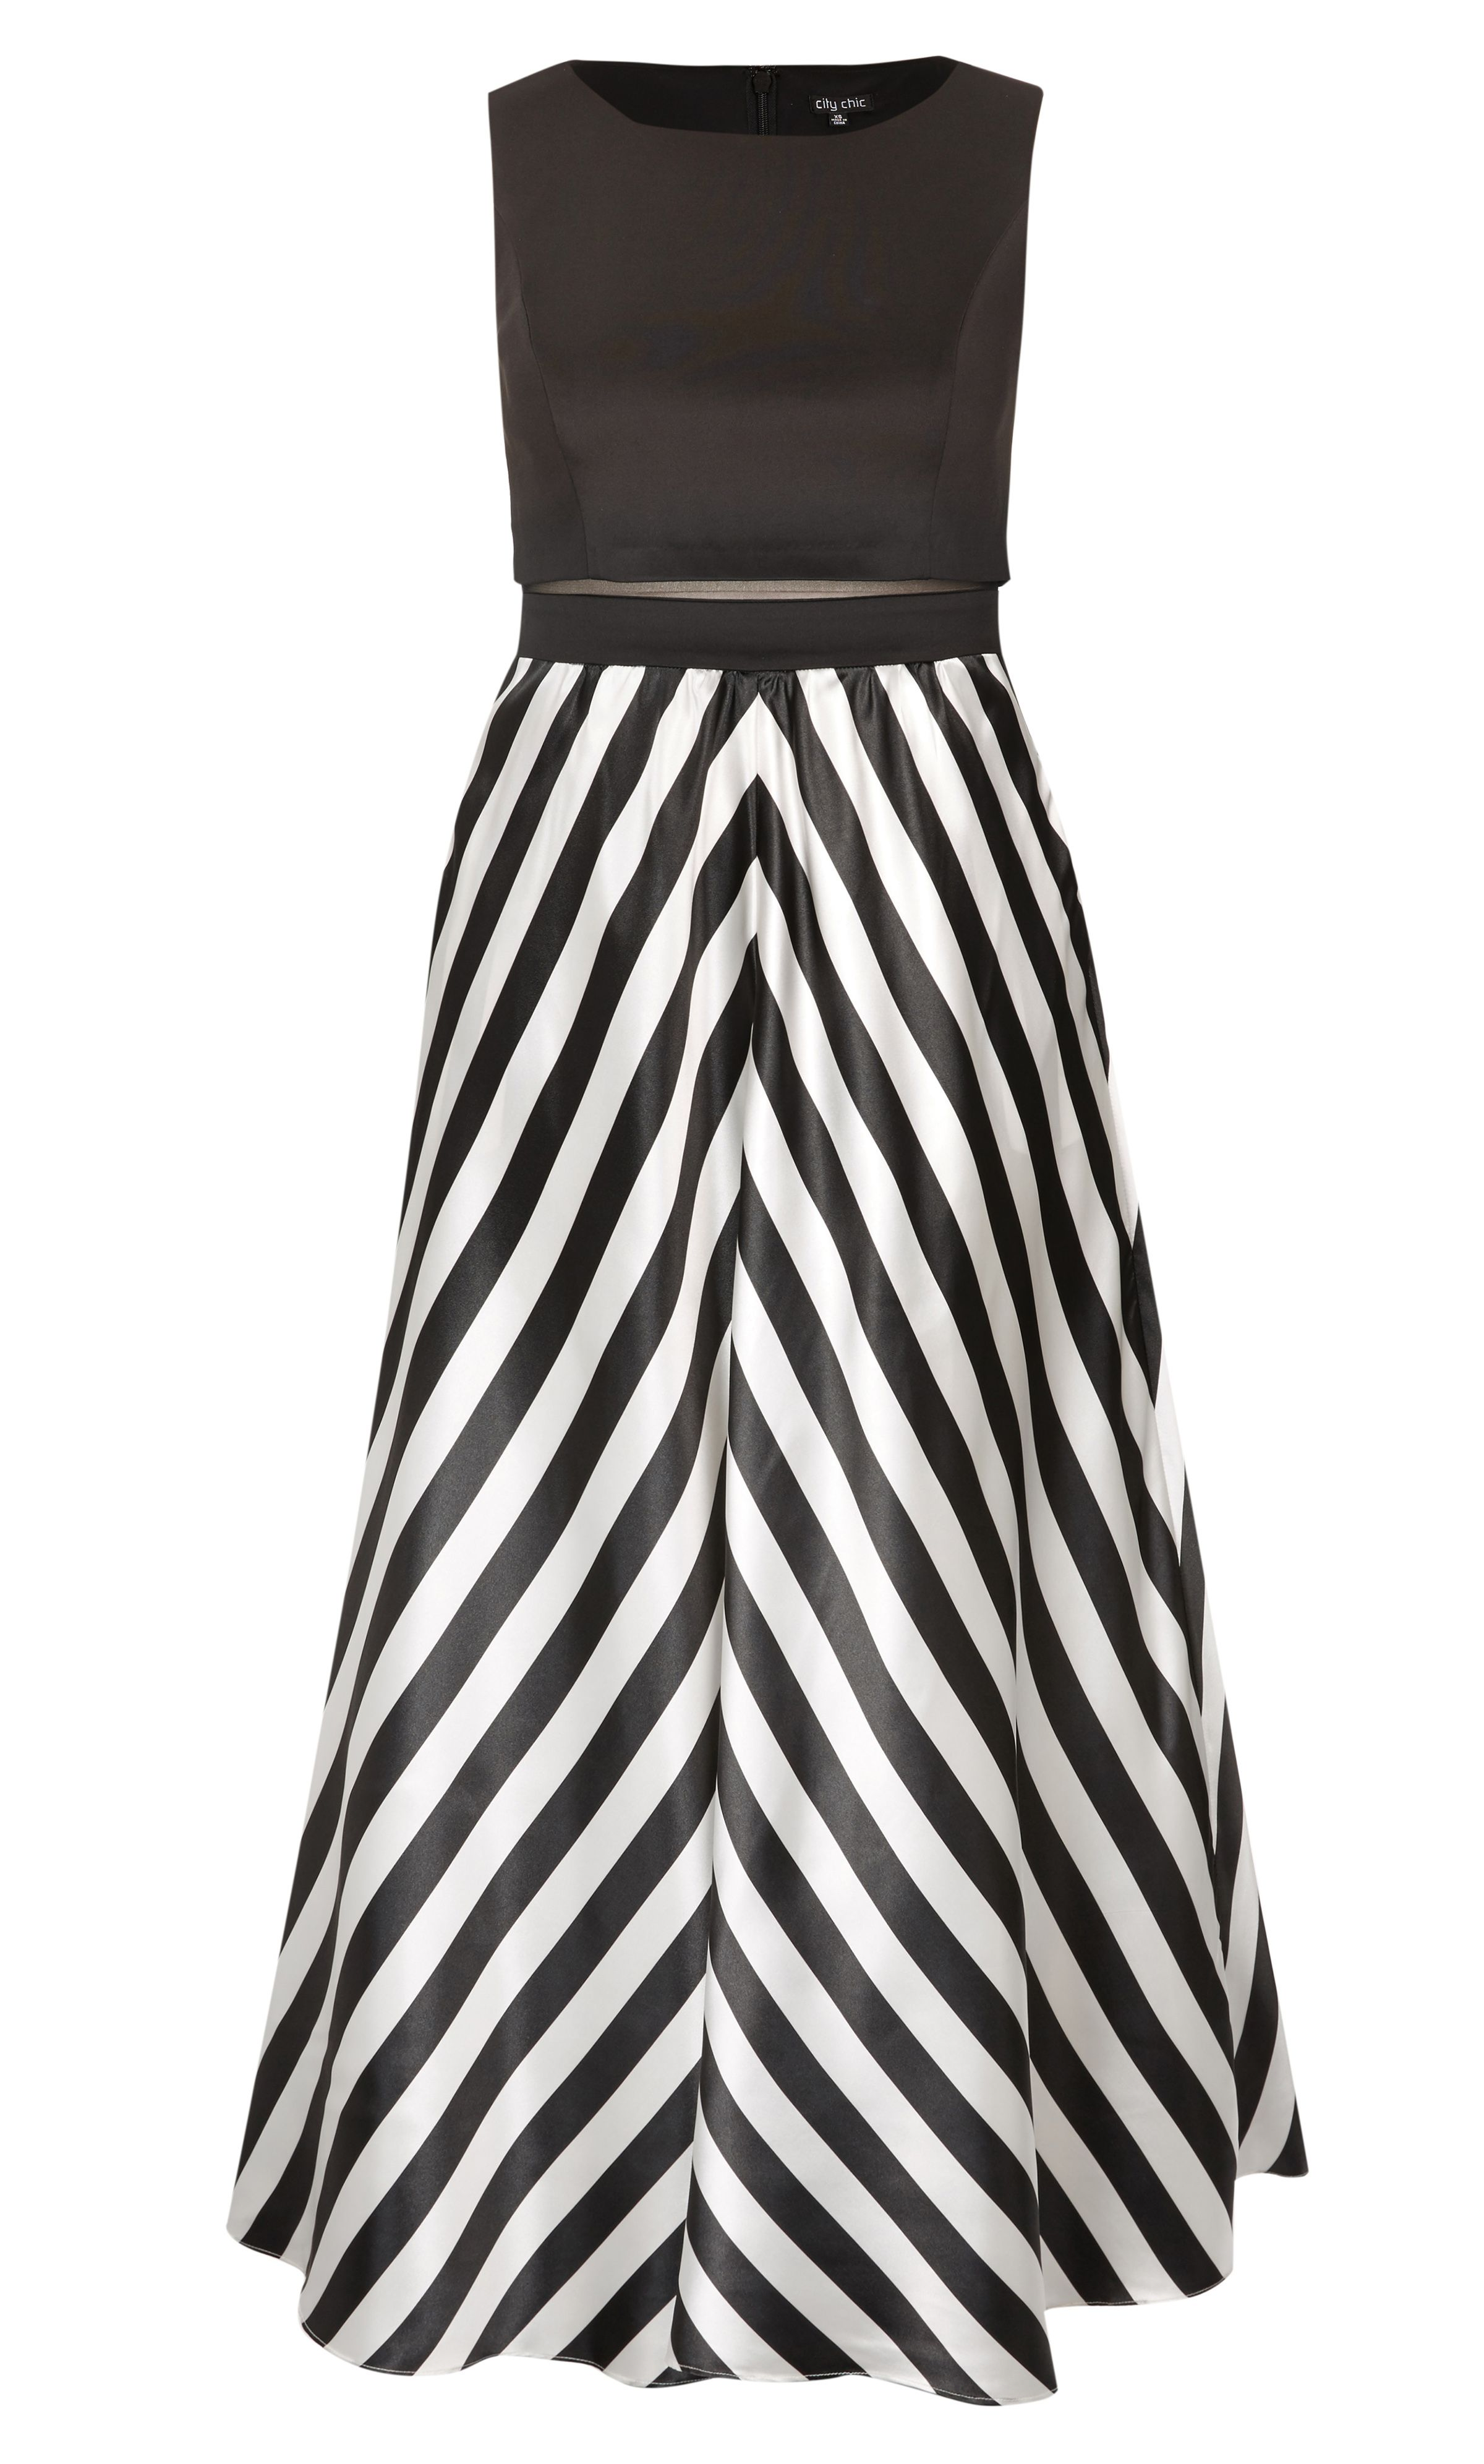 City Chic Satin Chevron Maxi Dress Womens Plus Size Fashion